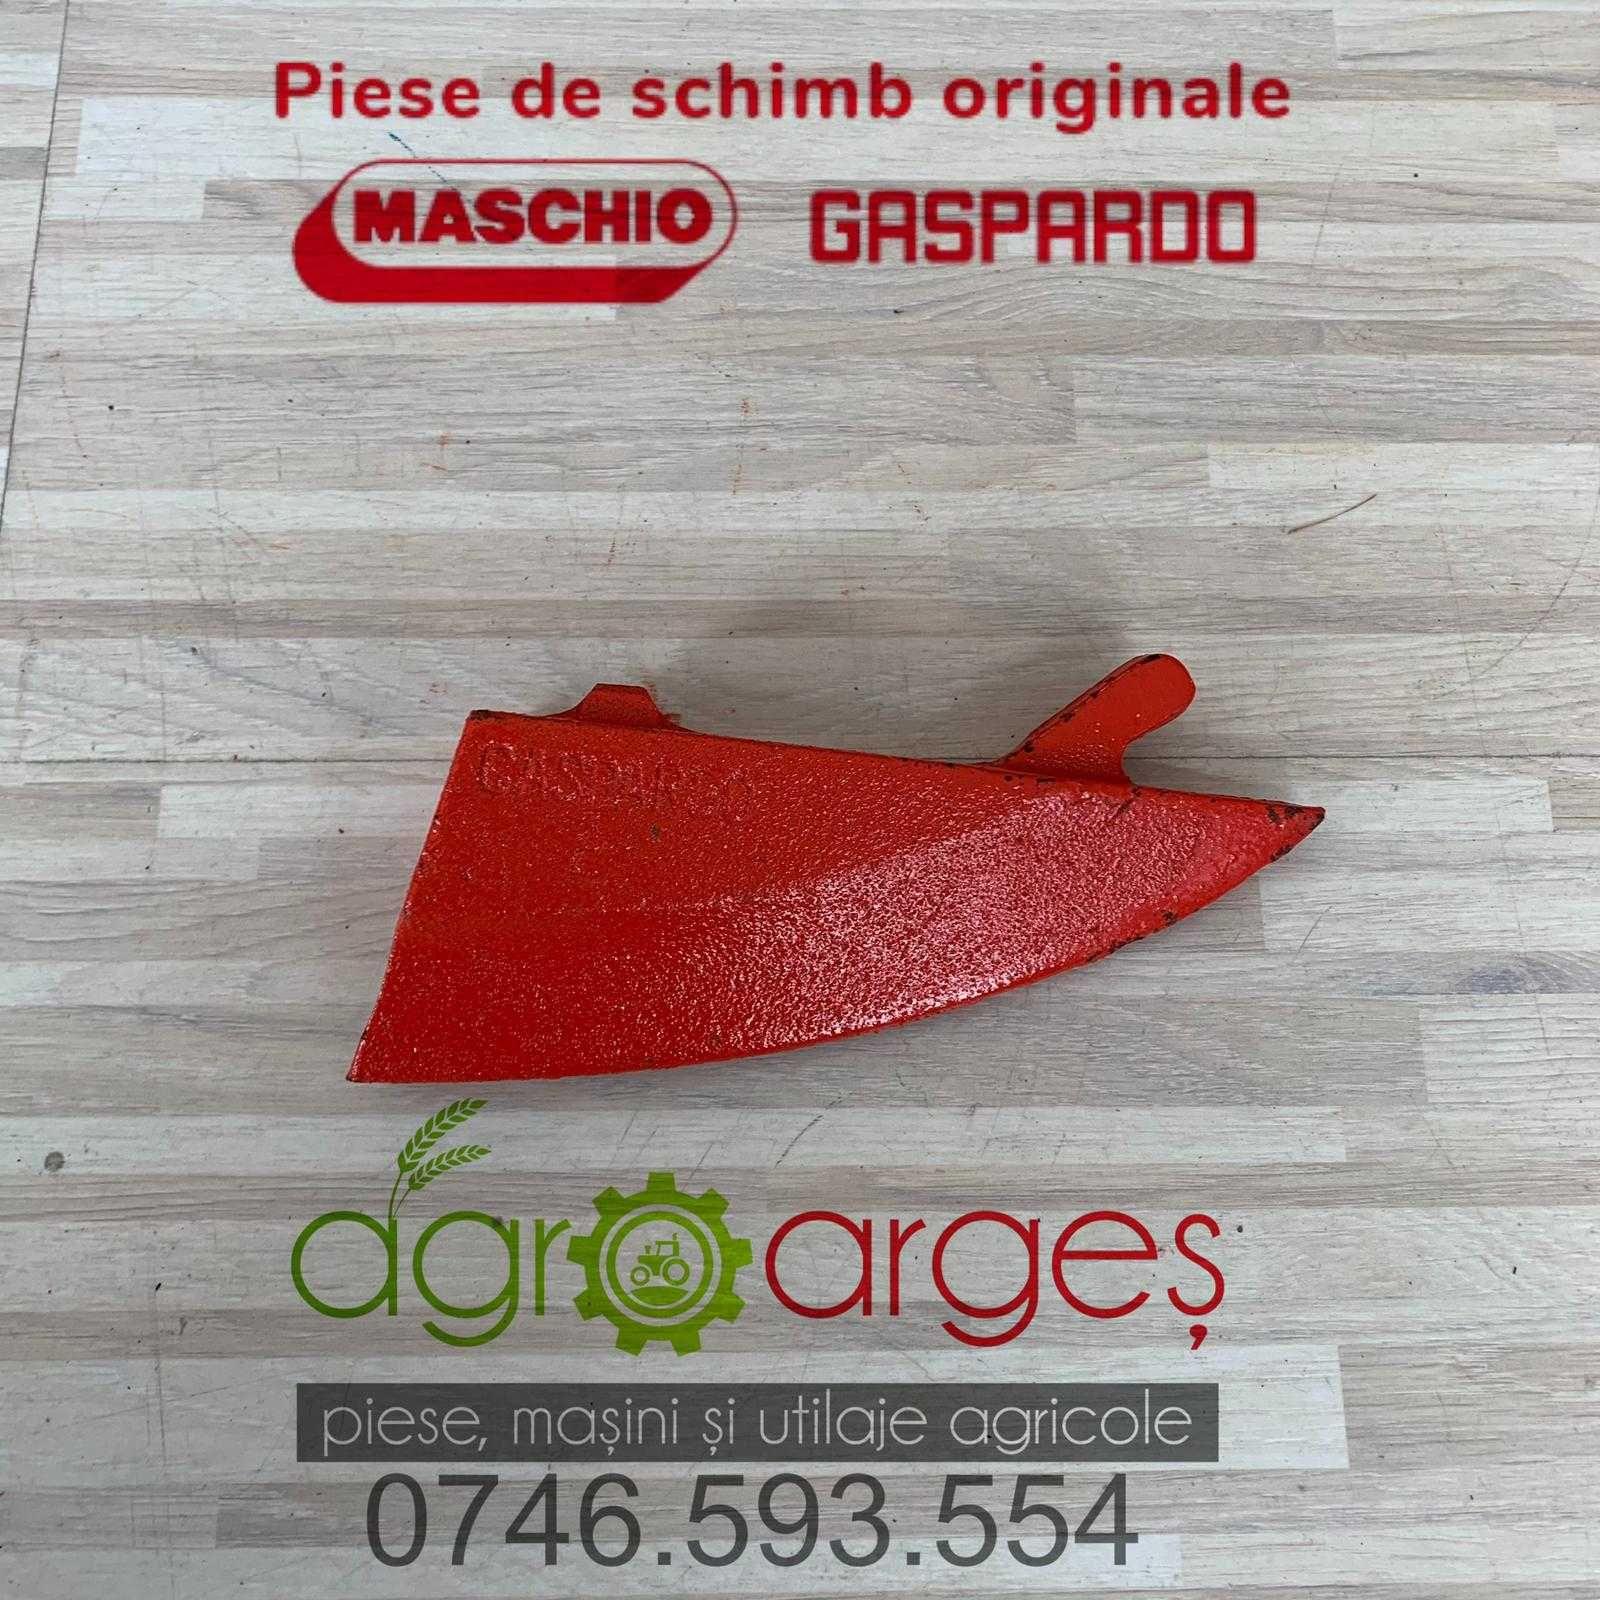 Brazdar Porumb G22270397R Gaspardo